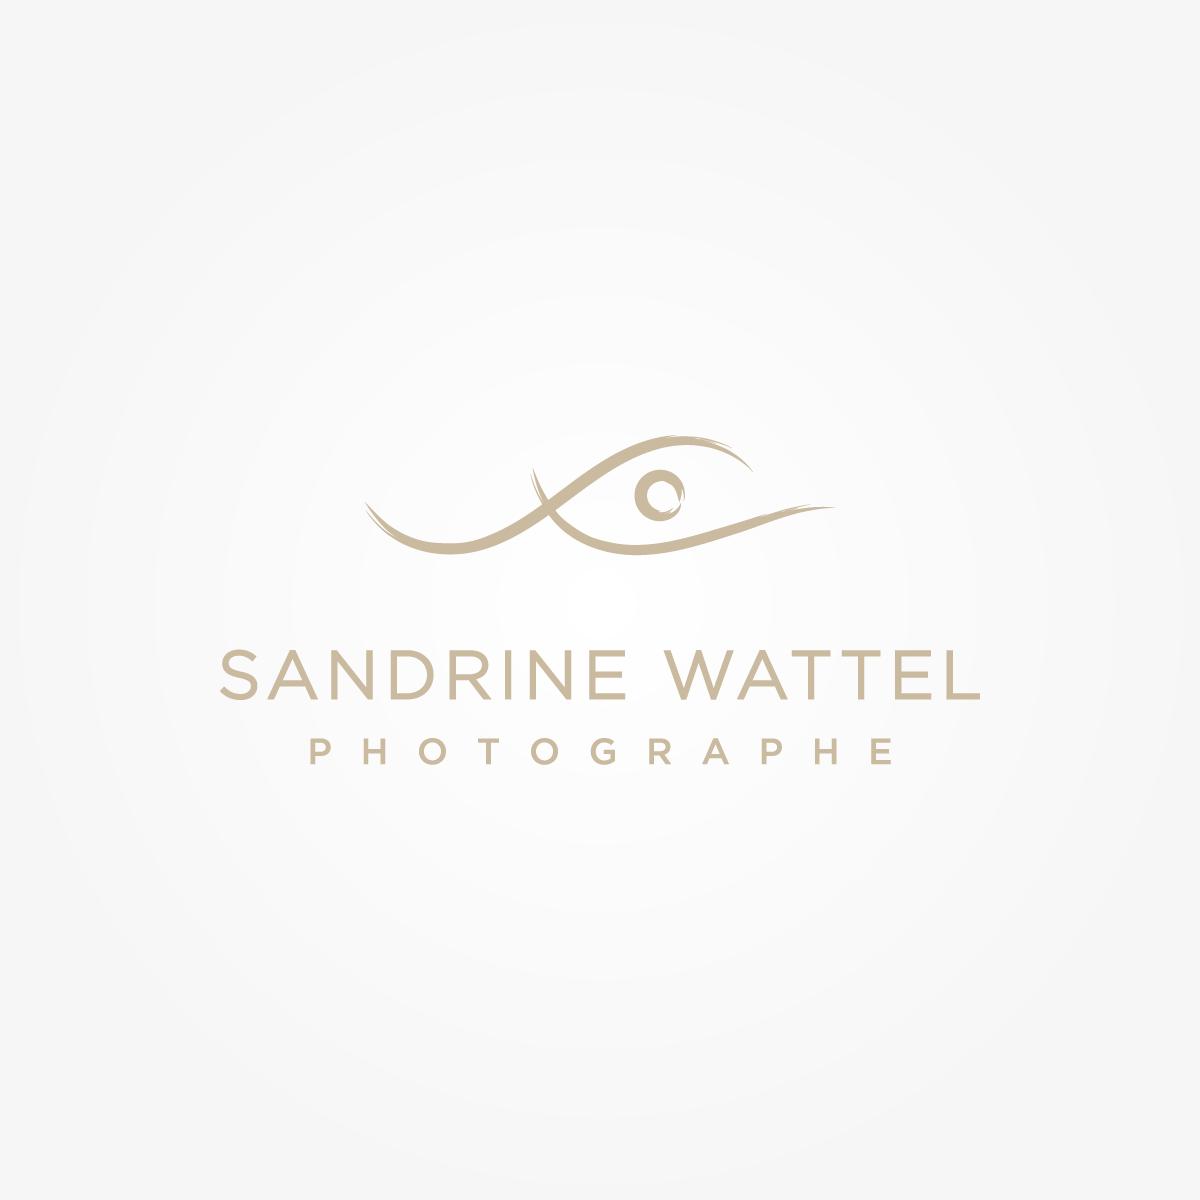 sandrine-wattel-logo